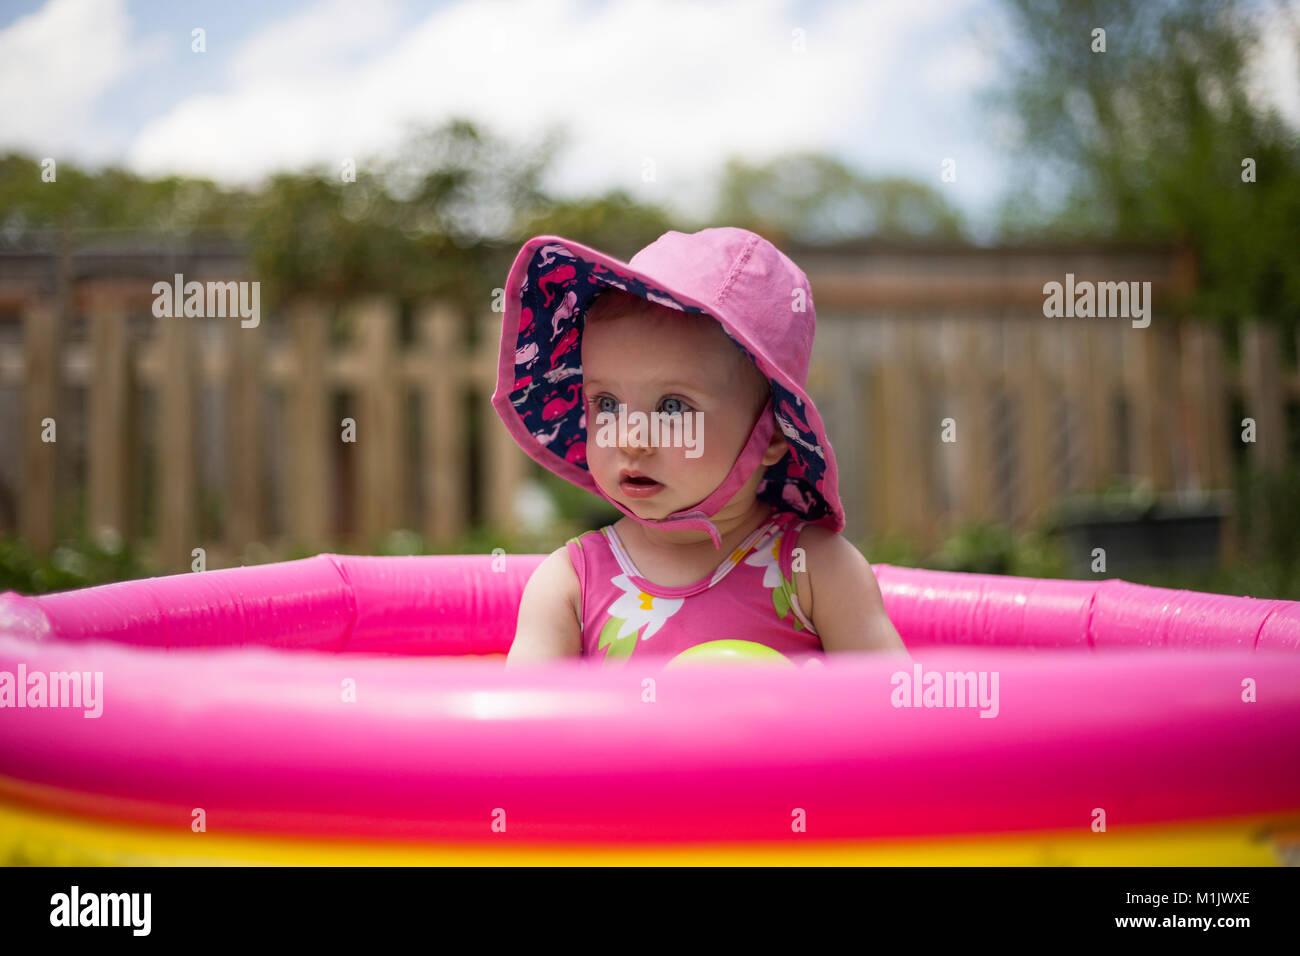 Baby in Pink Hat Sitting in Kiddie Pool - Stock Image